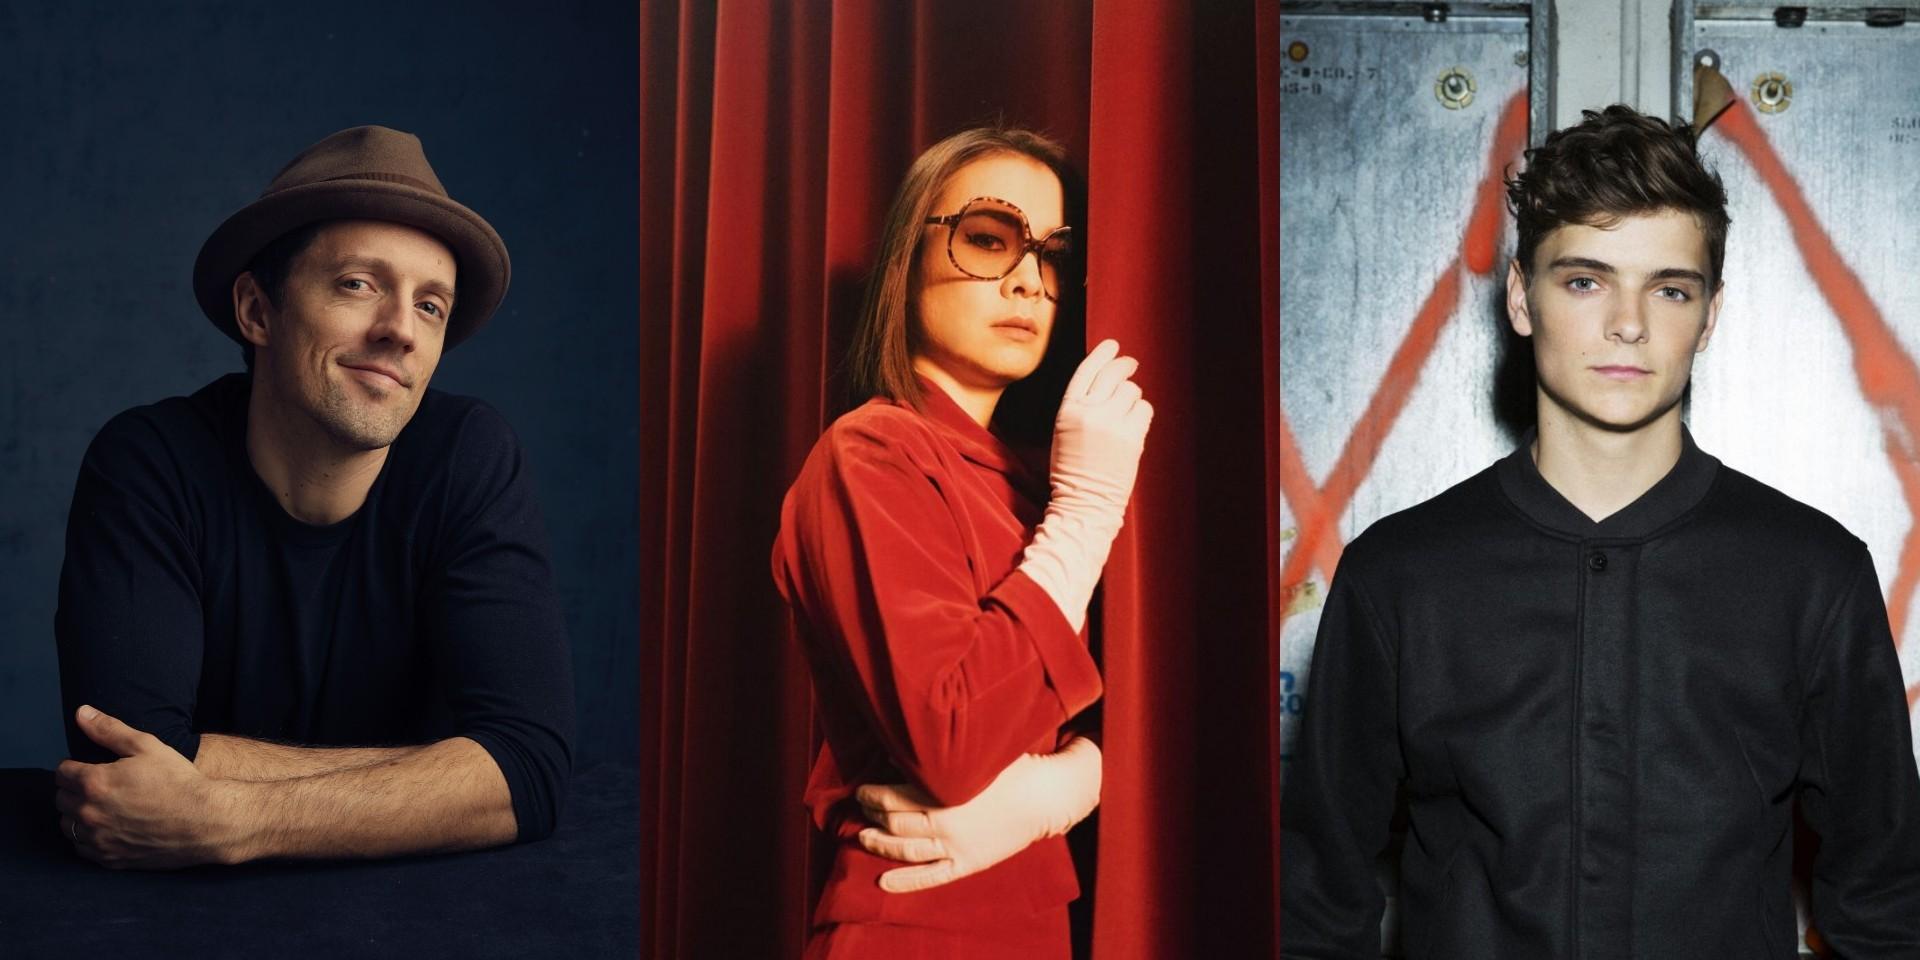 Fuji Rock Festival 2019 announces full lineup – Jason Mraz, Mitski, Martin Garrix and more confirmed